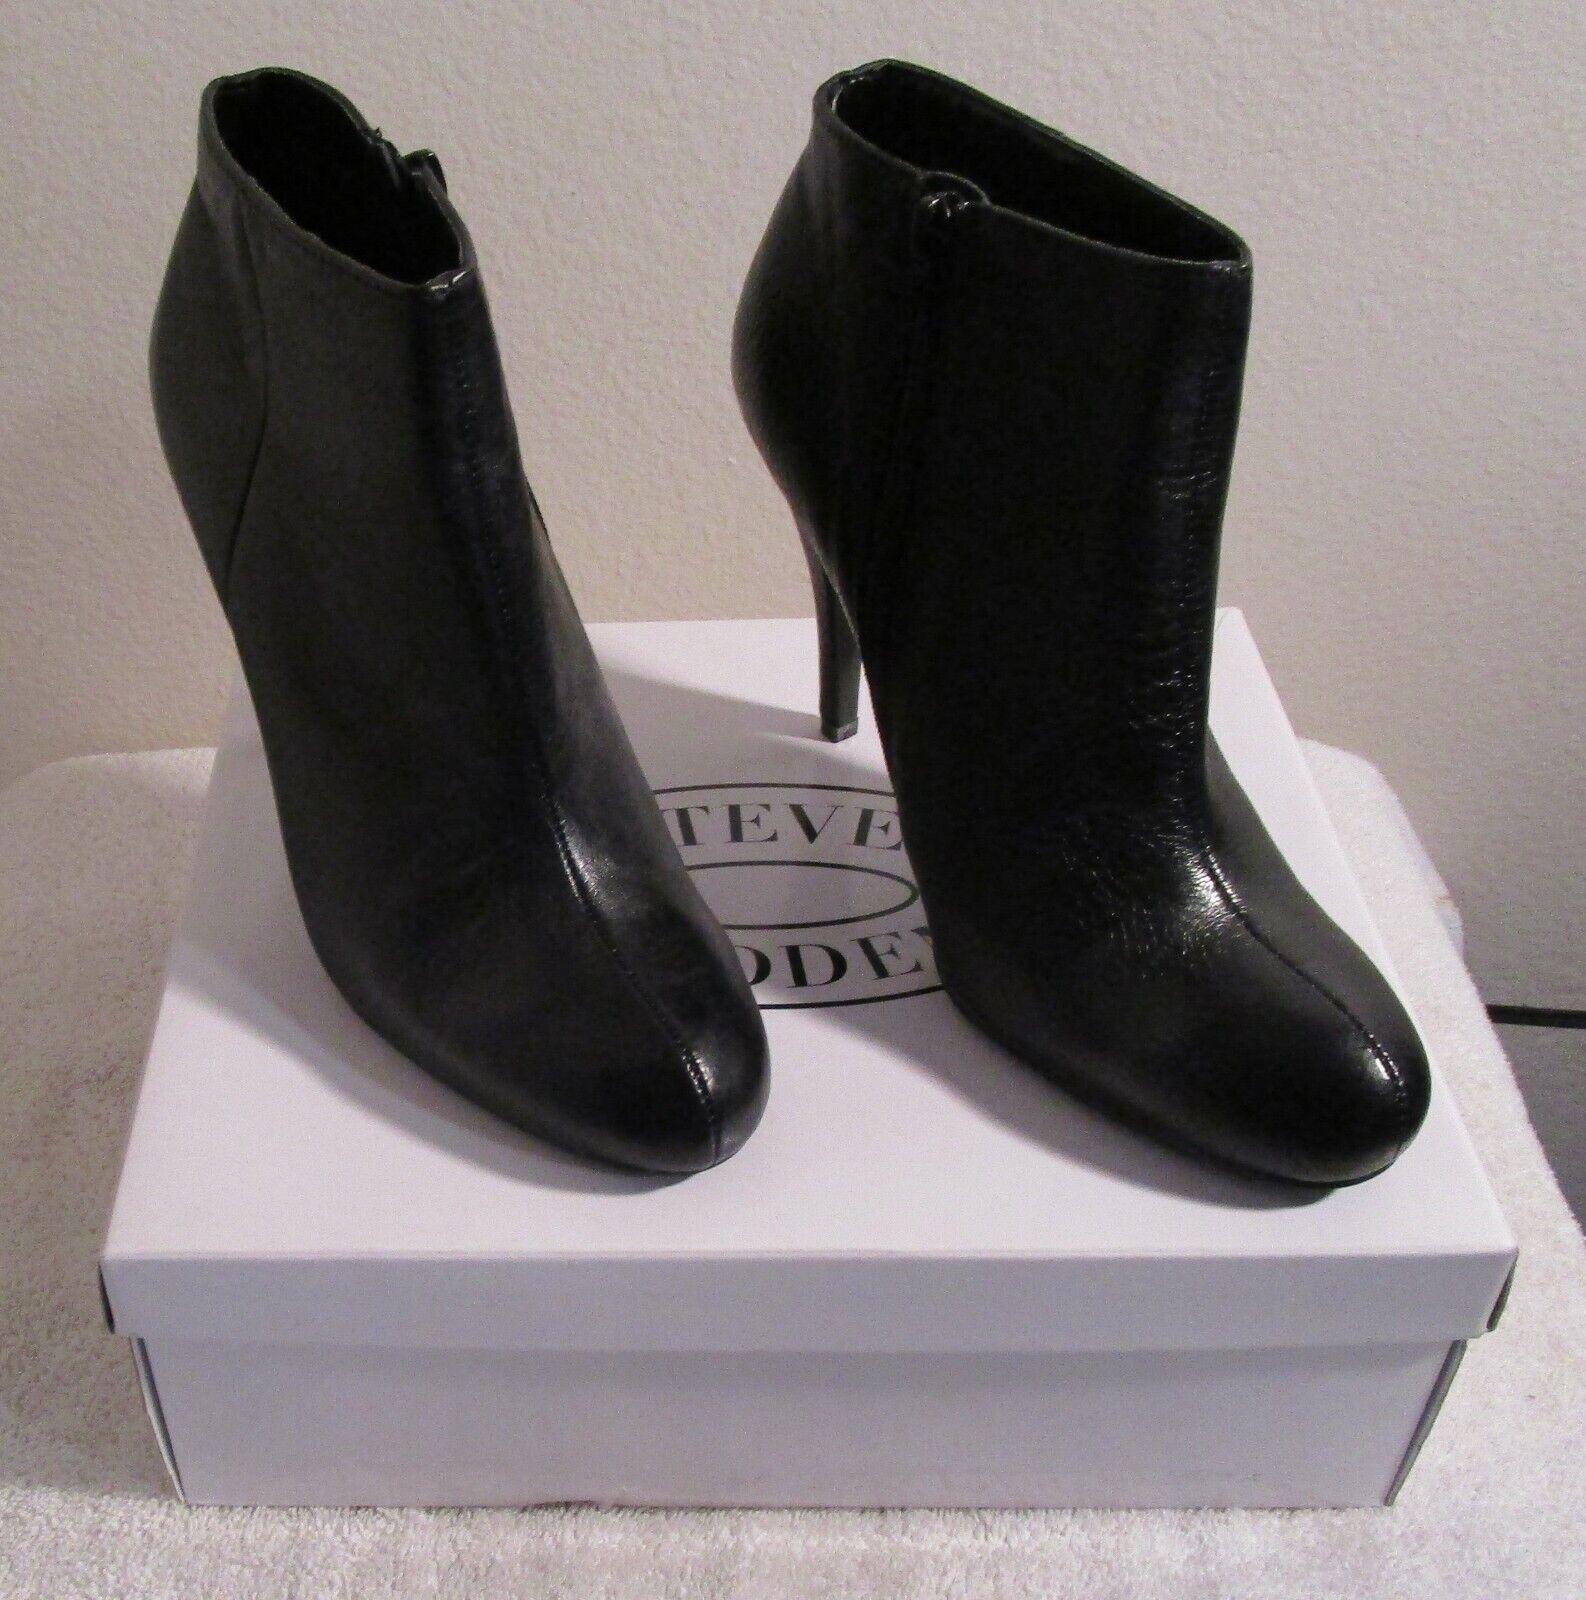 NIB Steve Madden Armen Womens Heeled Booties Boots 10 Black MSRP 90